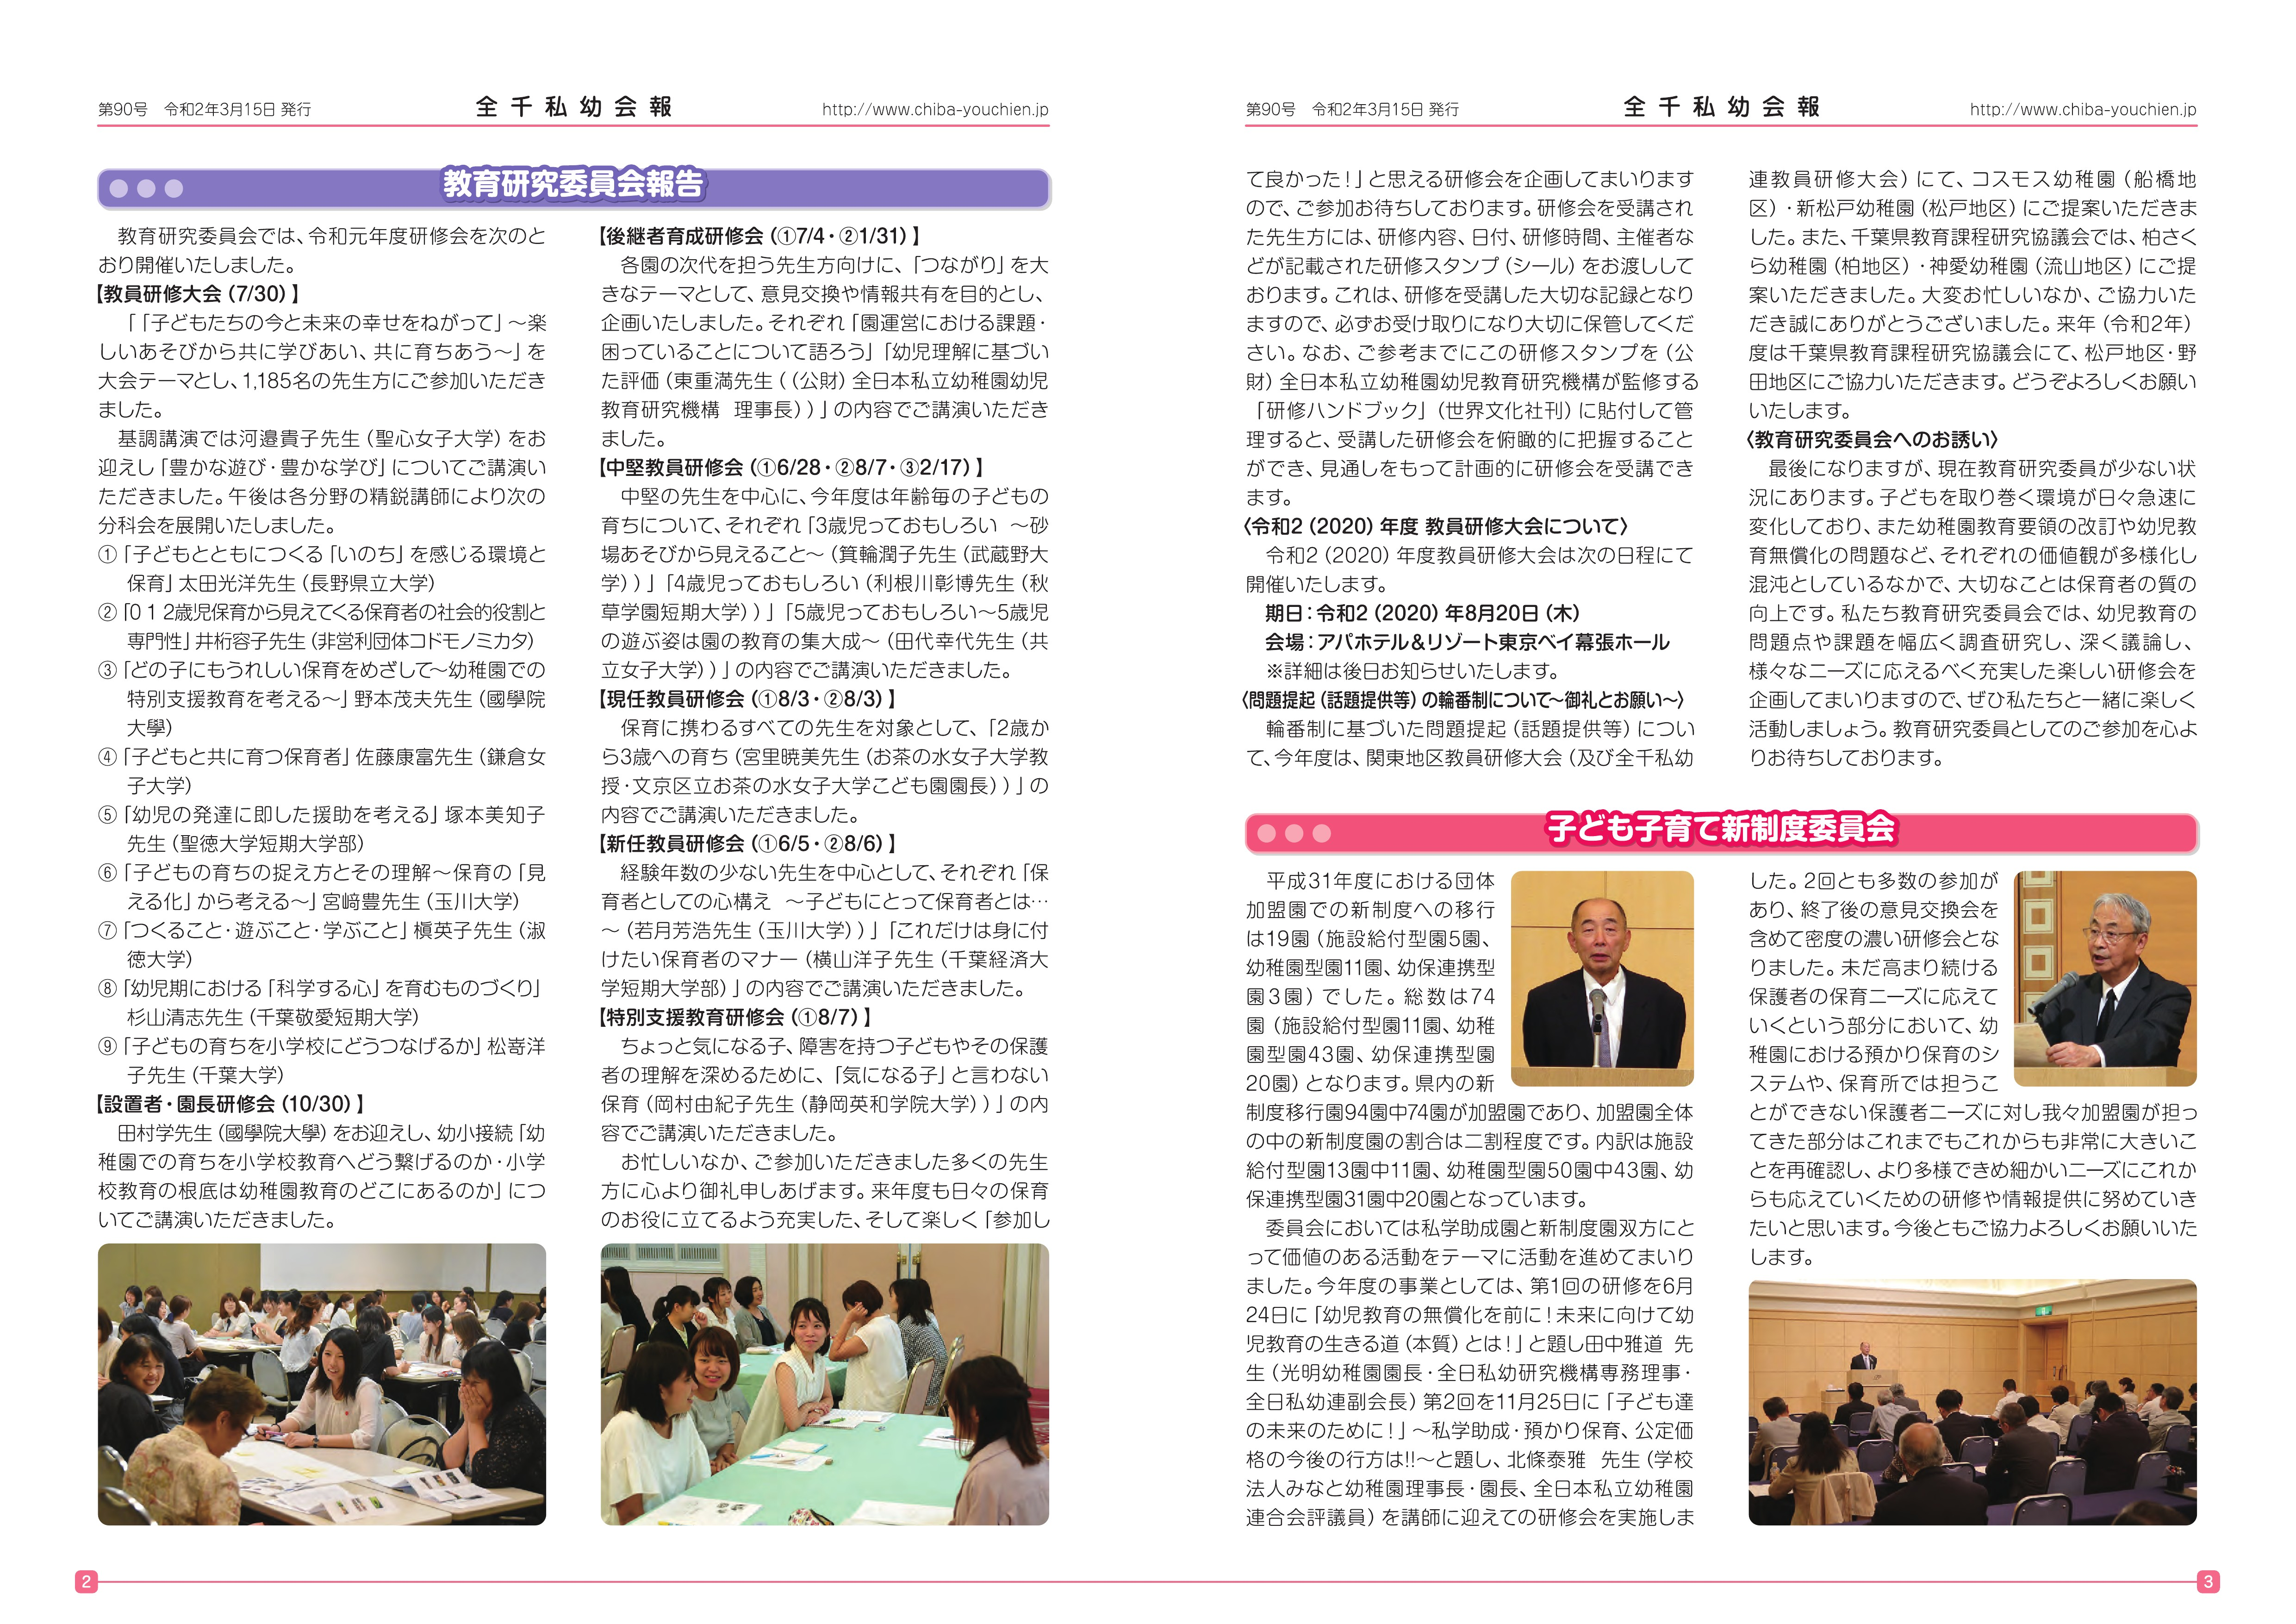 https://www.chiba-youchien.jp/news/90%E5%8F%B7P2_P3_0309.jpg